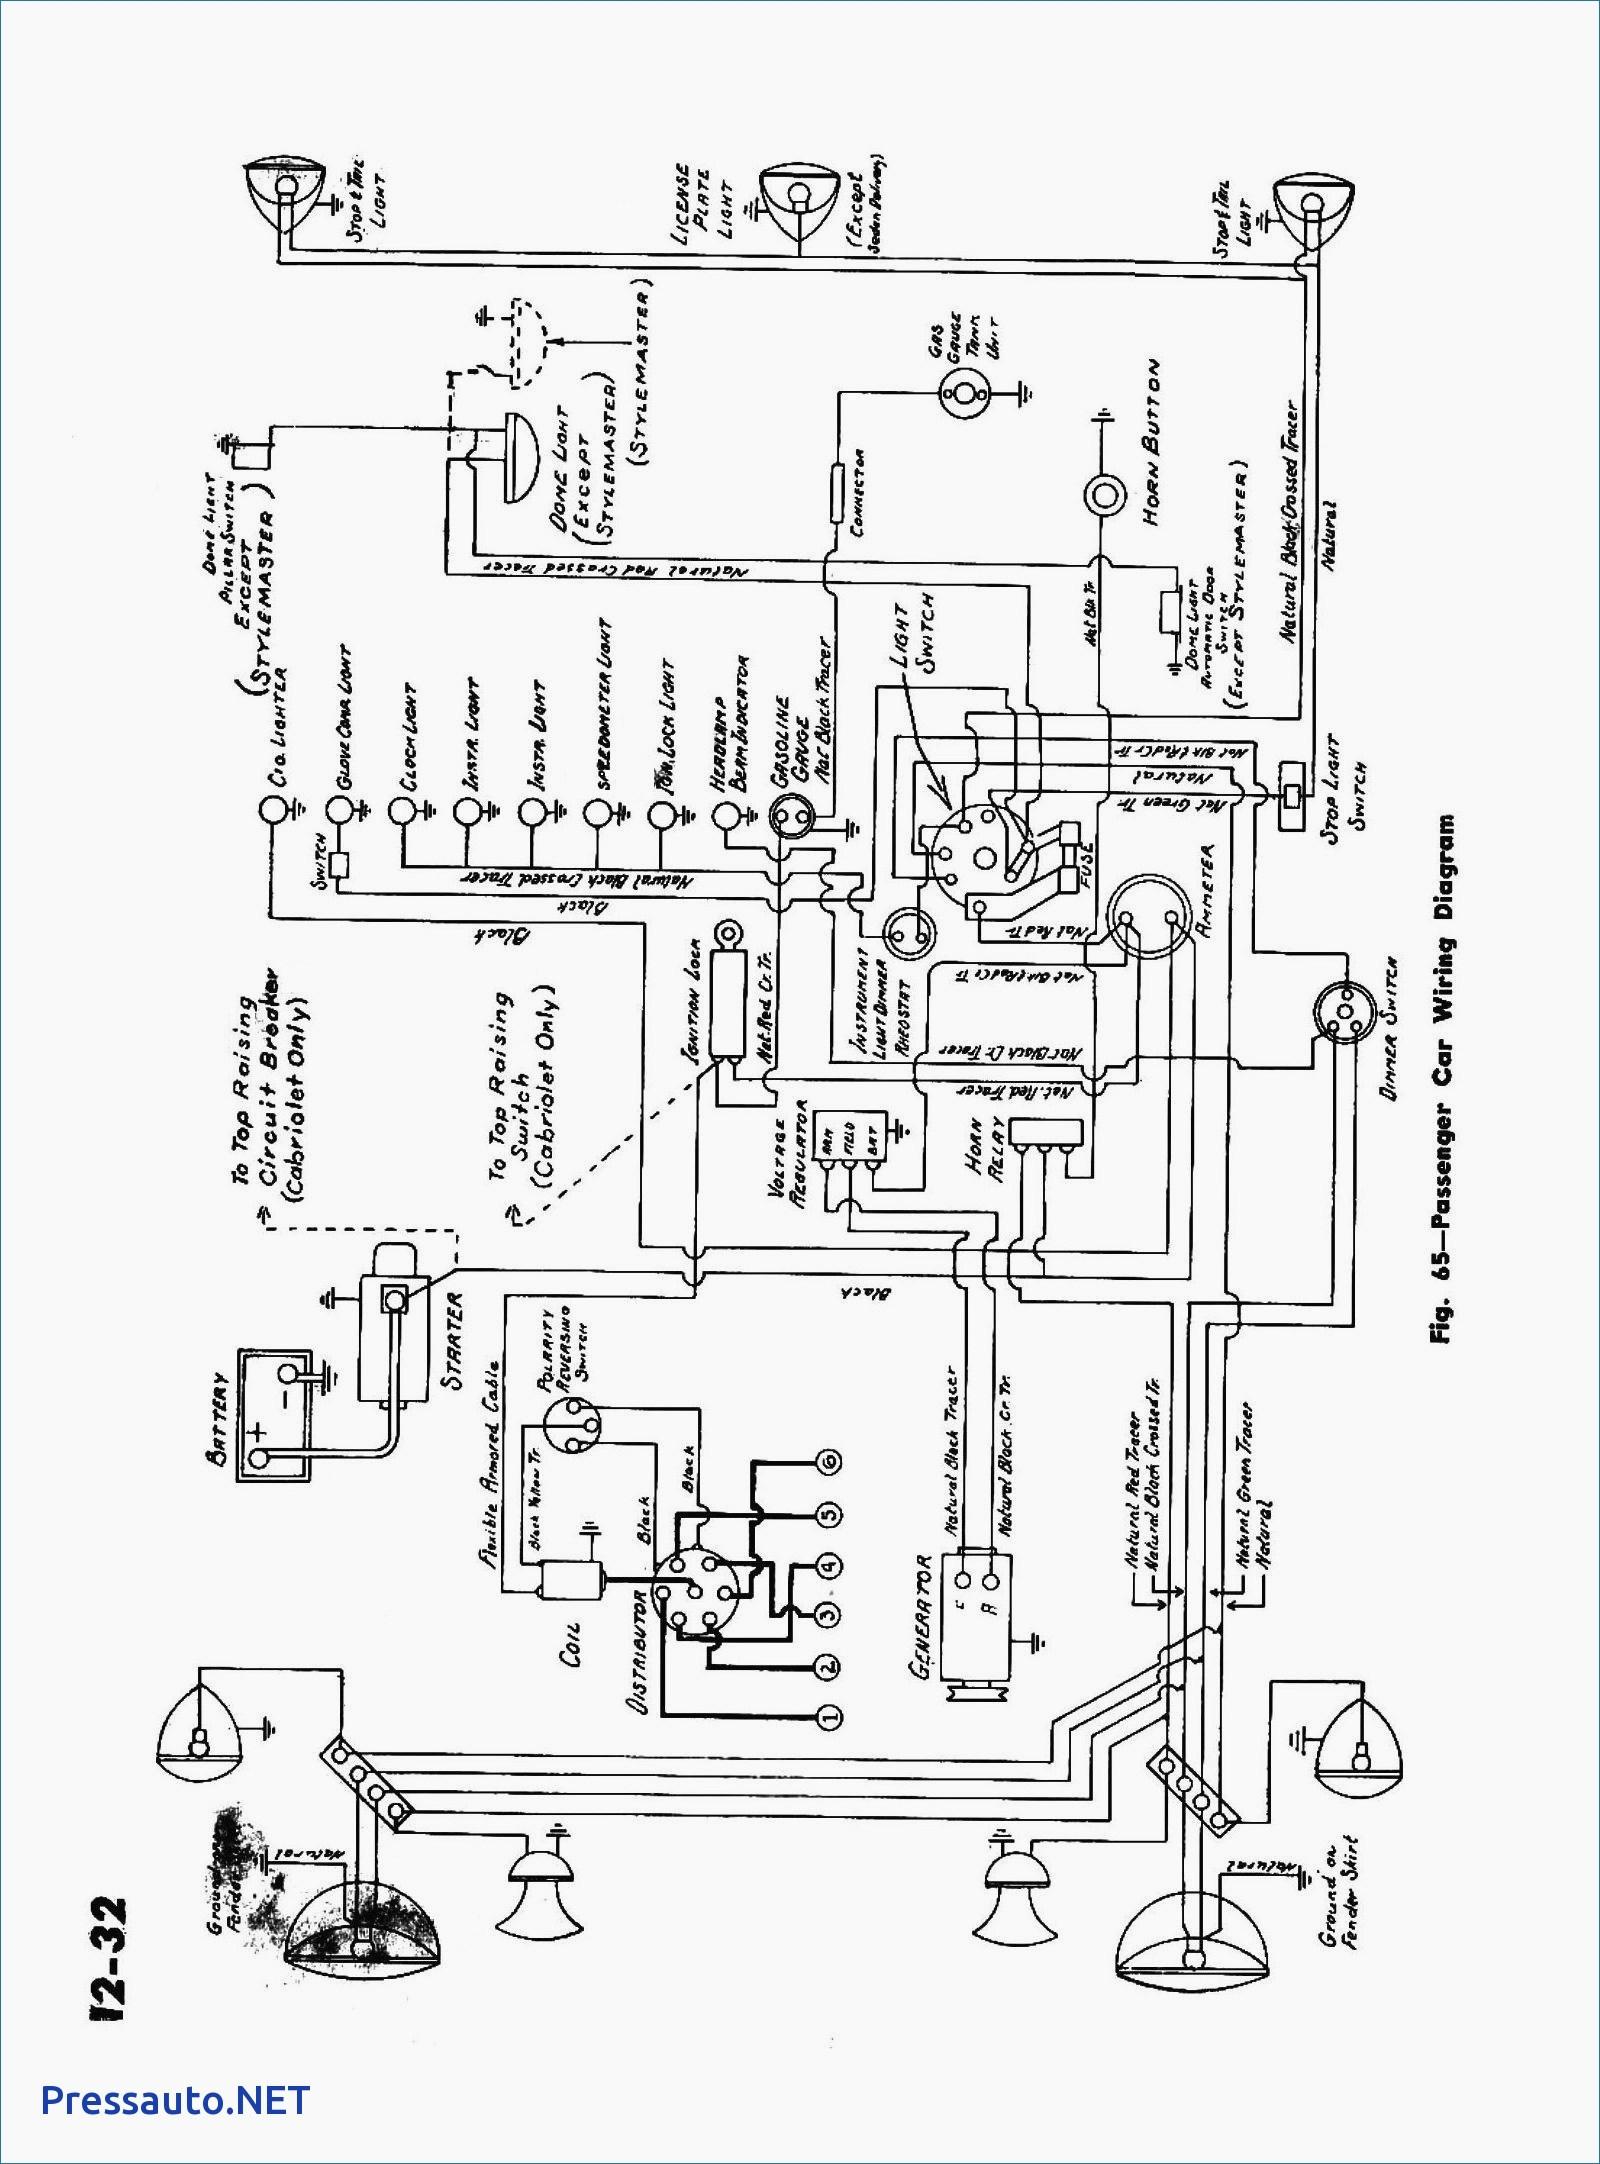 Crestron Thermostat Wiring Diagram